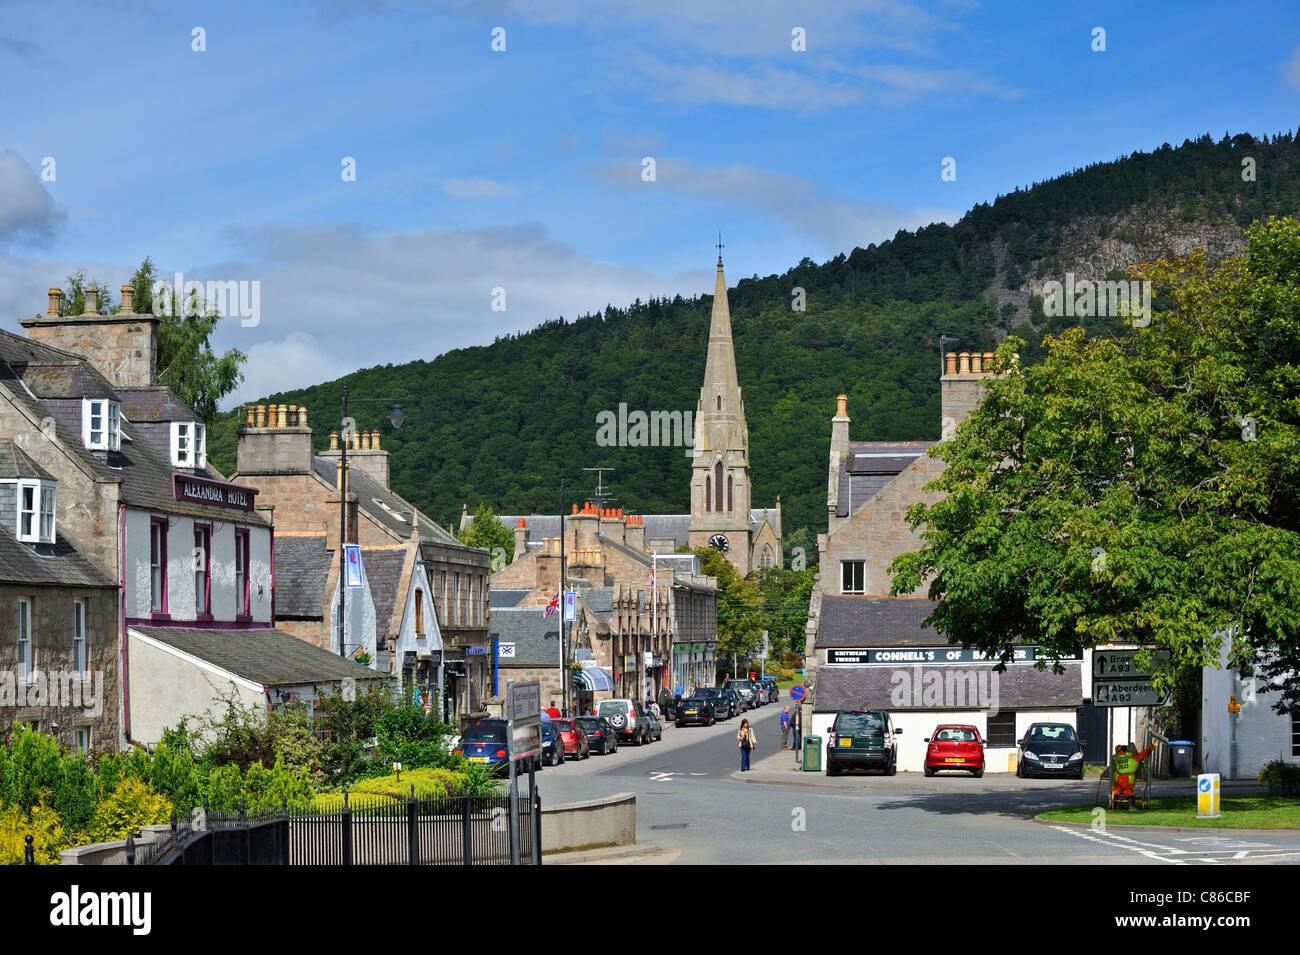 bridge-street-ballater-royal-deeside-aberdeenshire-scotland-united-C86CBF.jpg